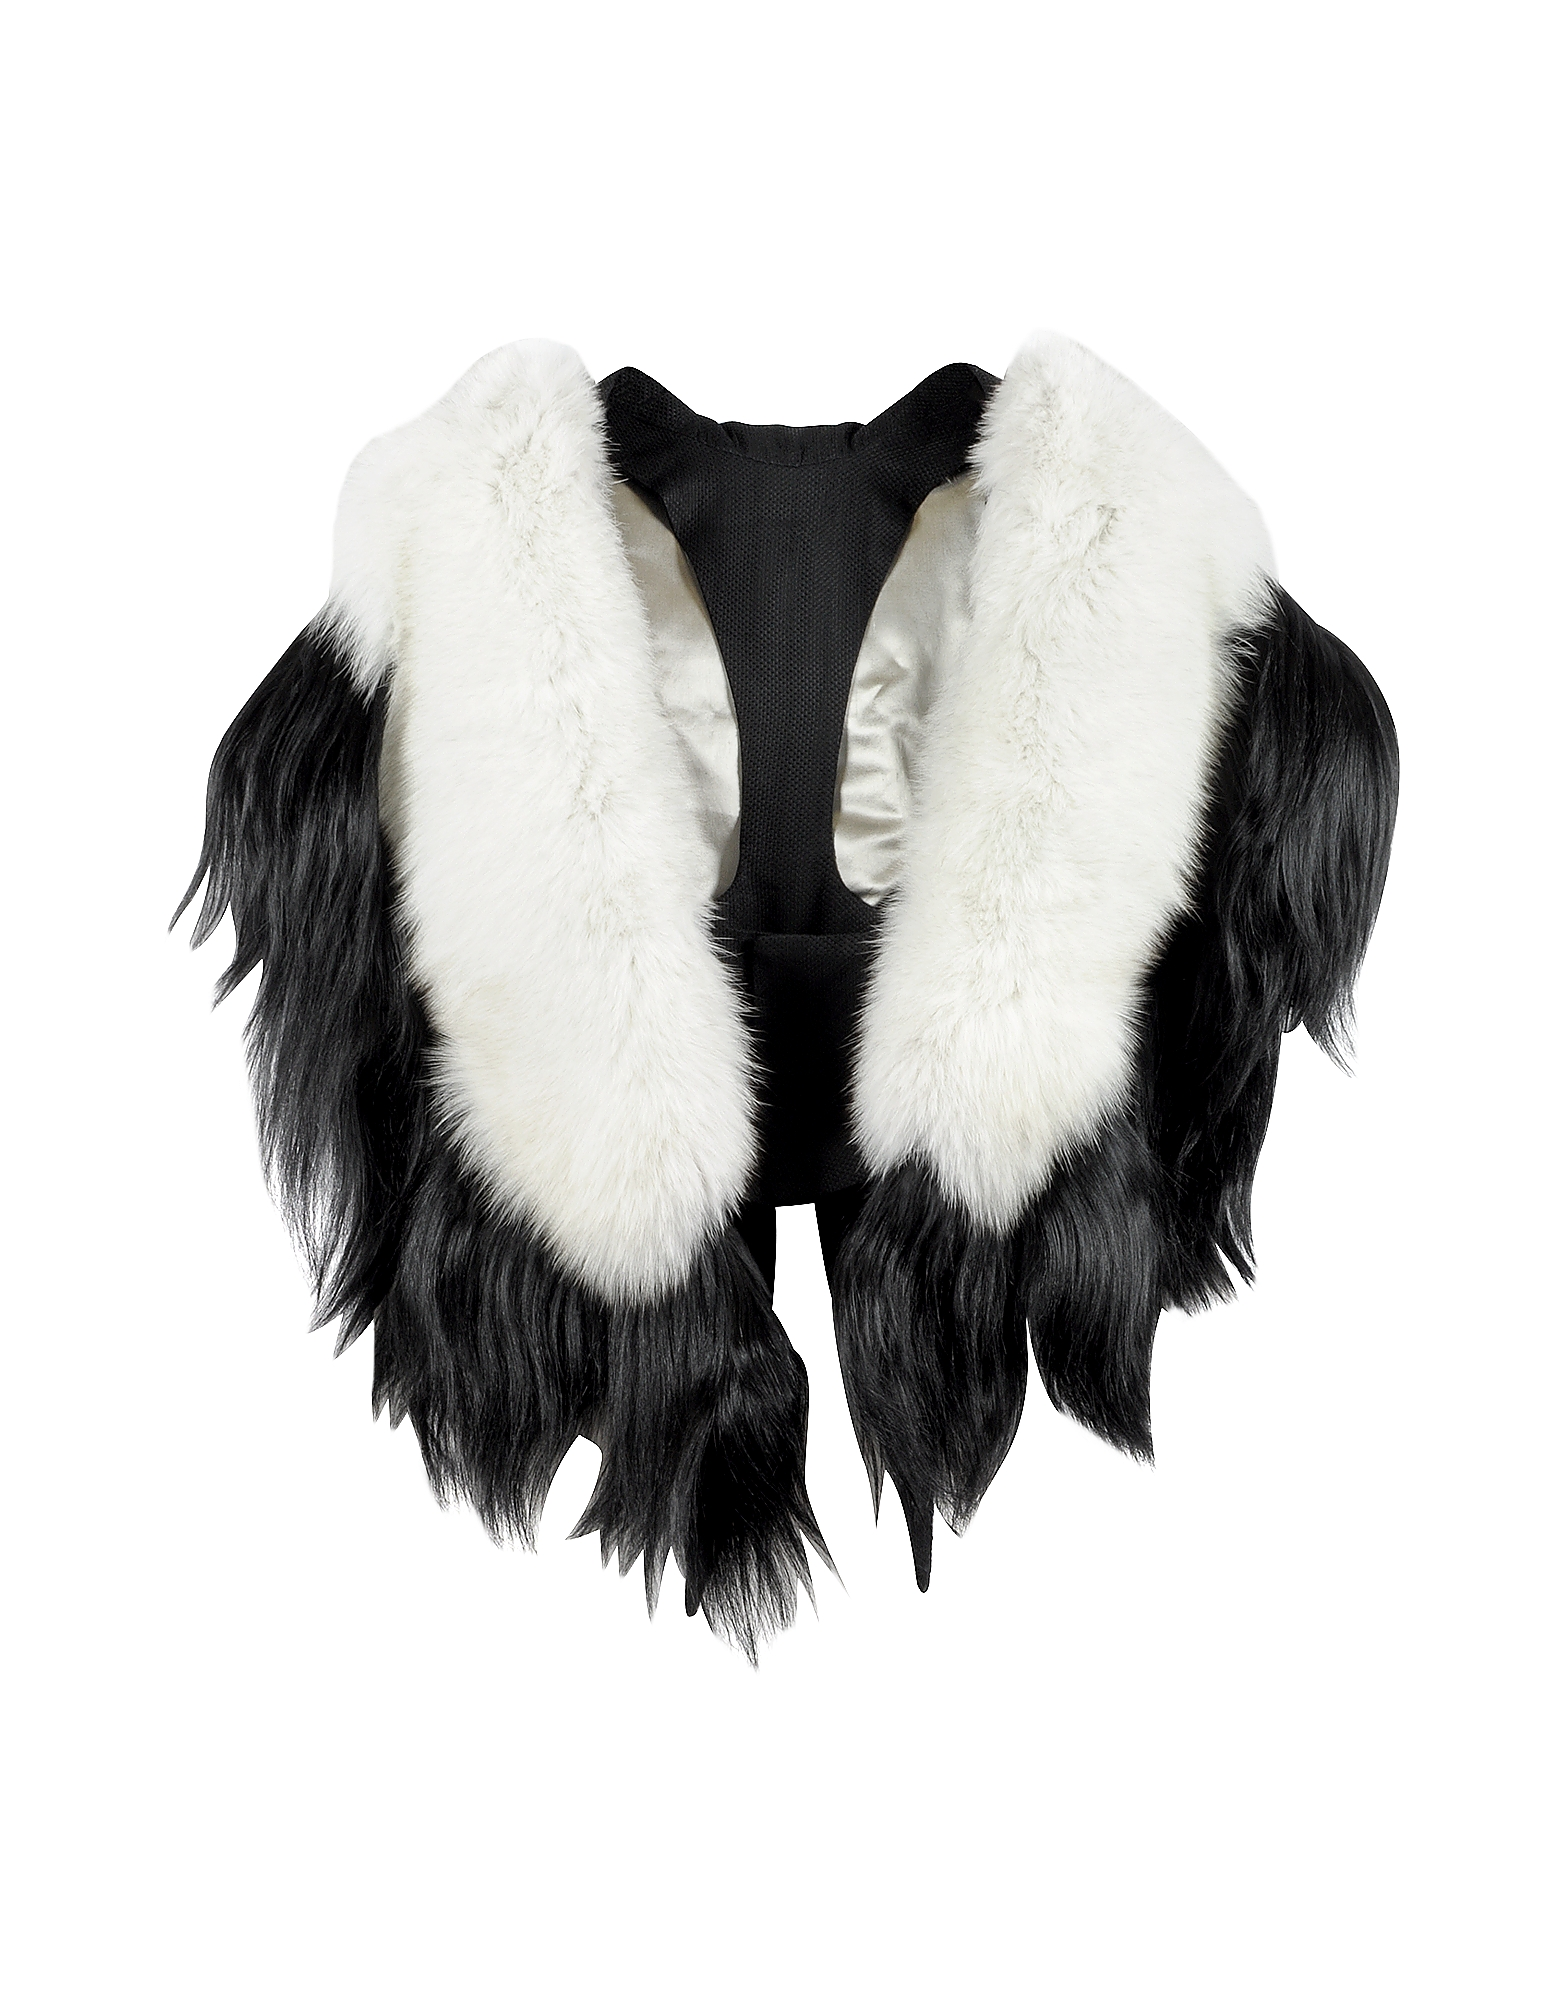 Bad Black Kite White and Black Fur Stole